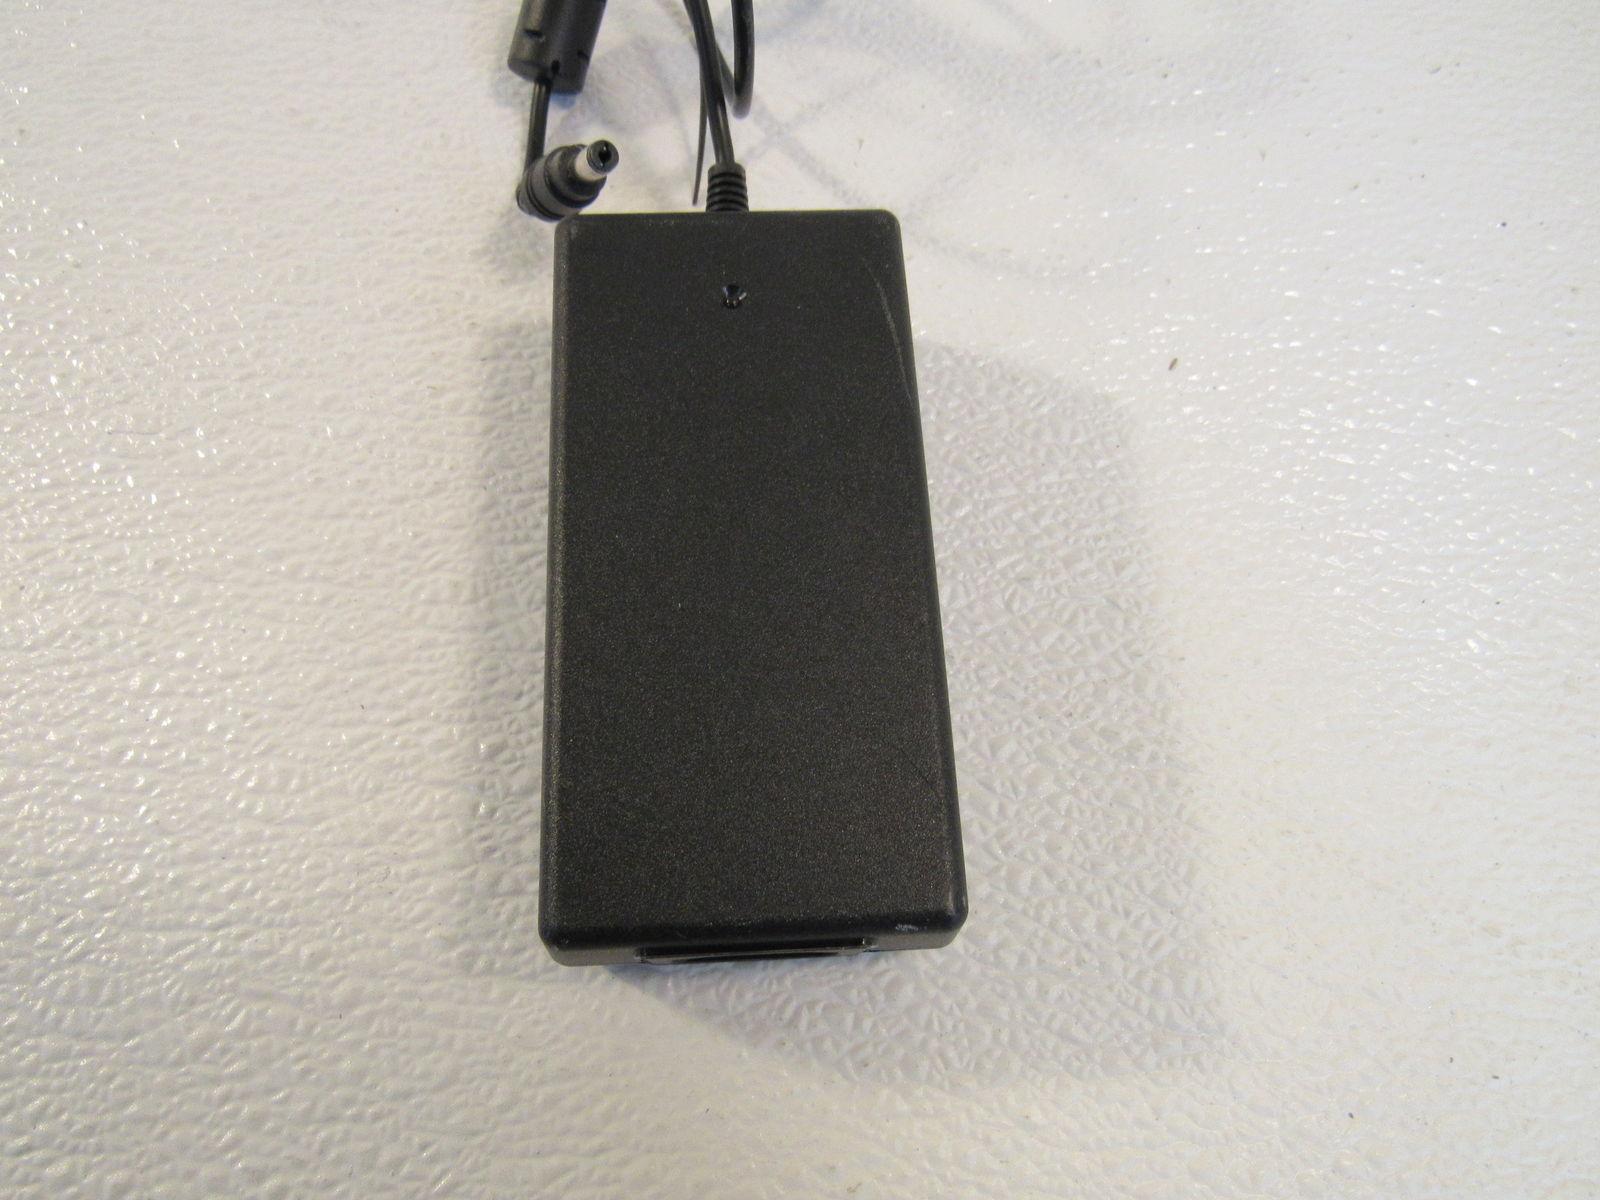 Li Shin AC Power Adapter Black Input 100 to 240V Output 12V 4.0A 0217B1248